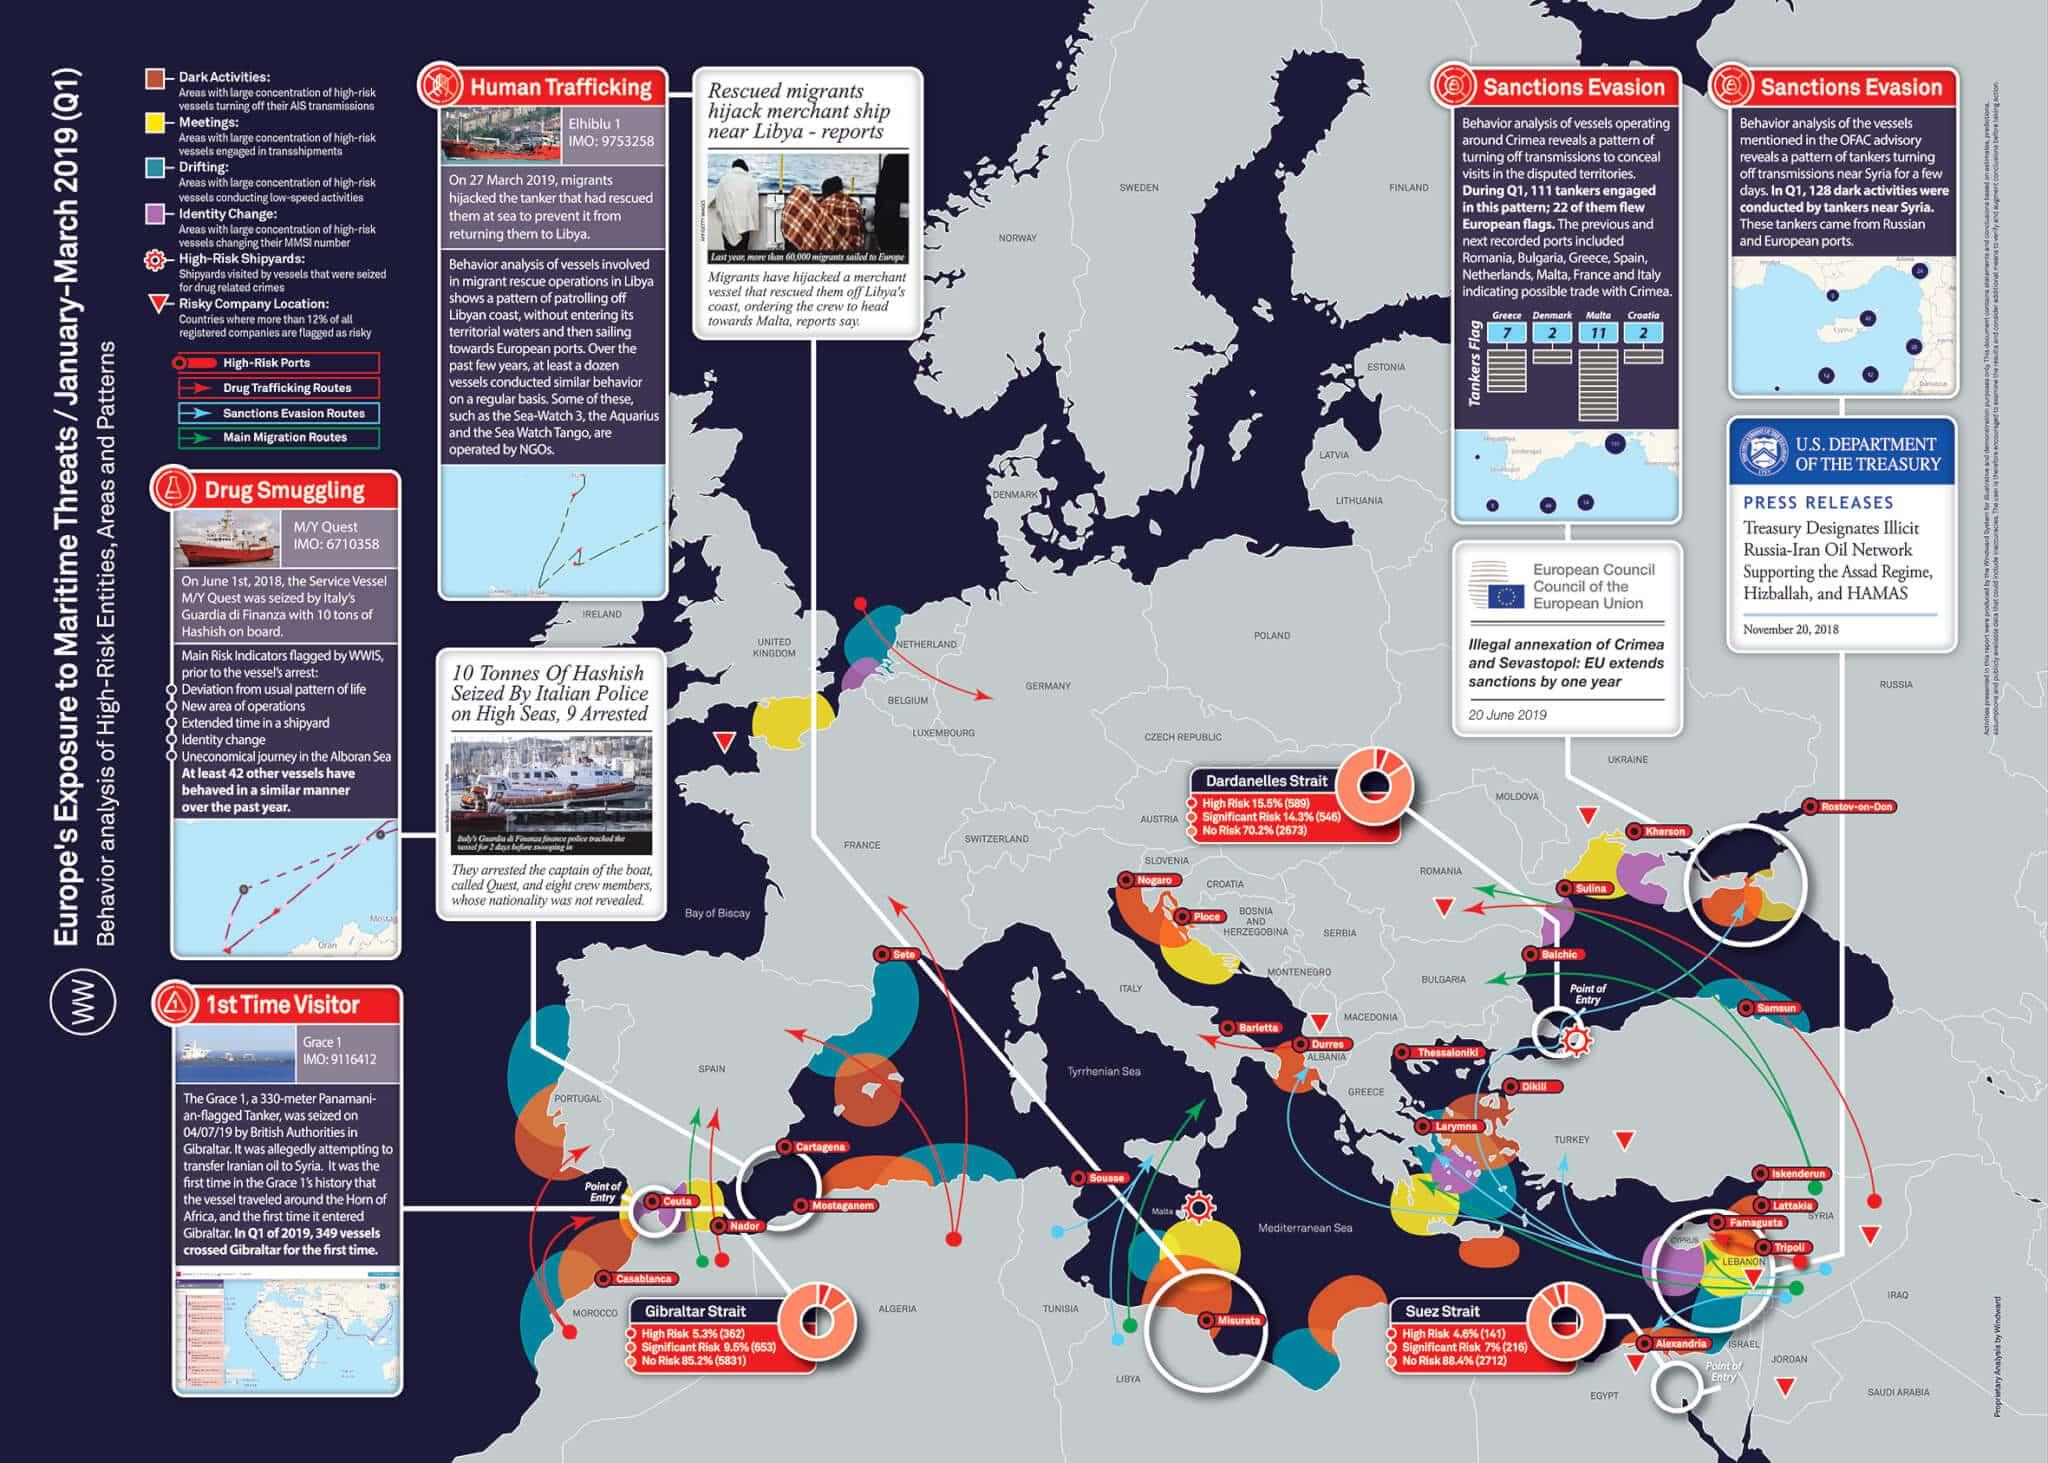 Europe Threat Map